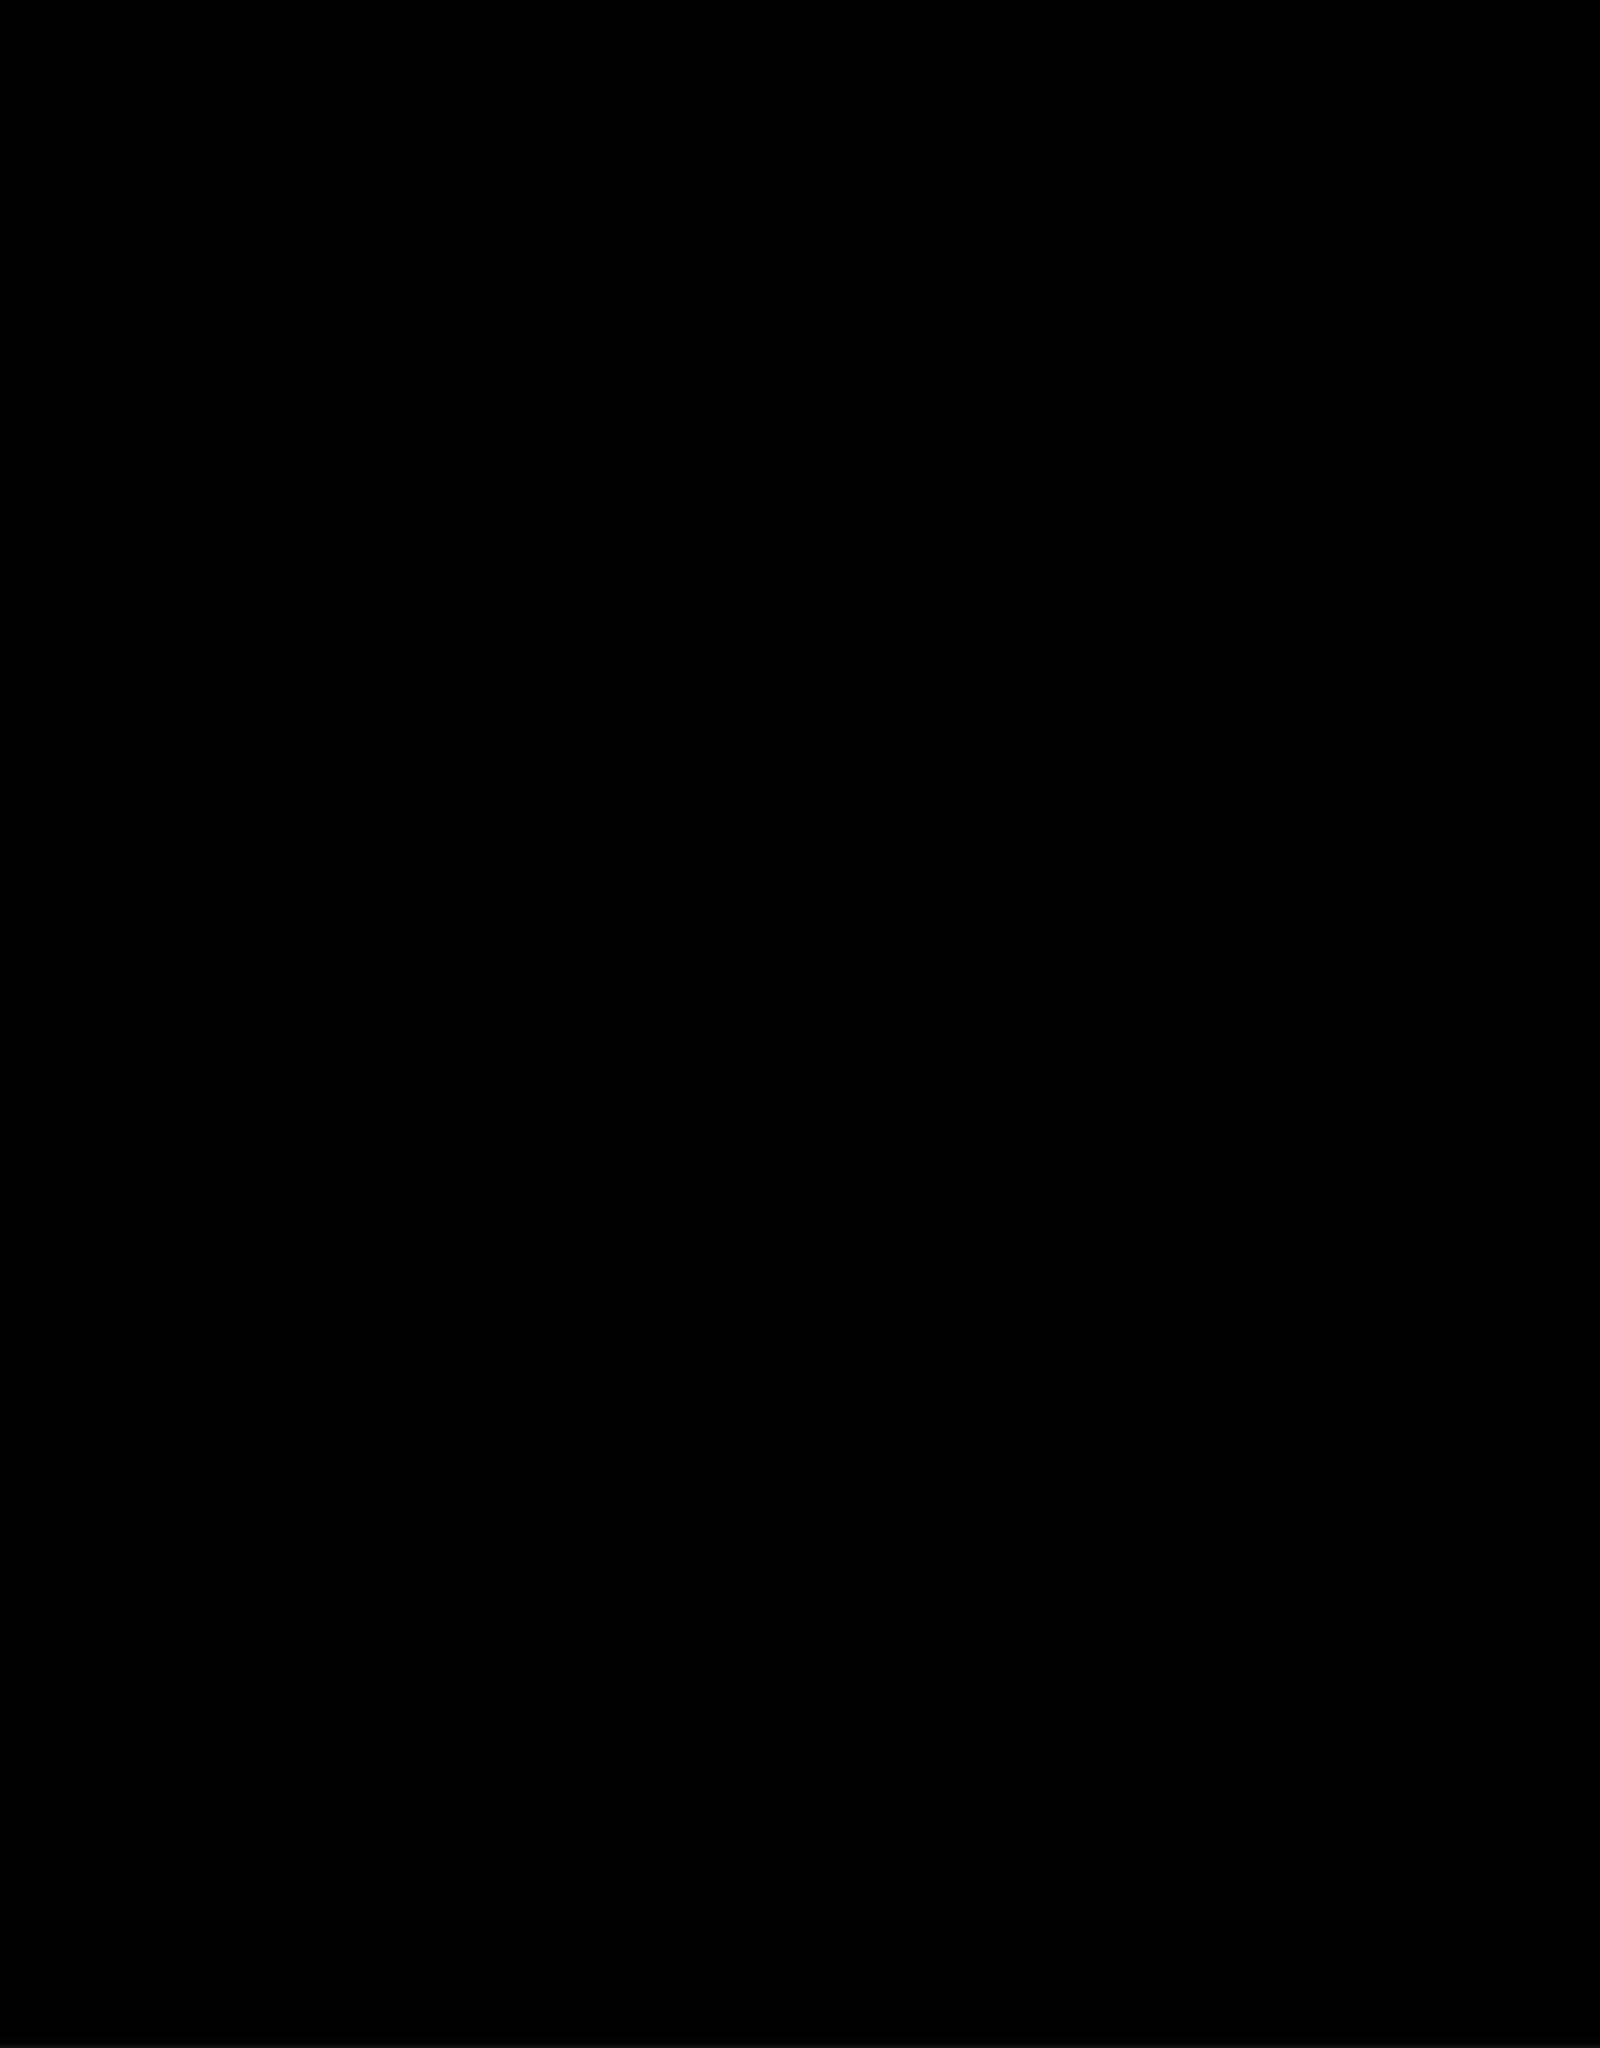 Meemoza Jumpsuit Brie PE21 Meemoza Noir